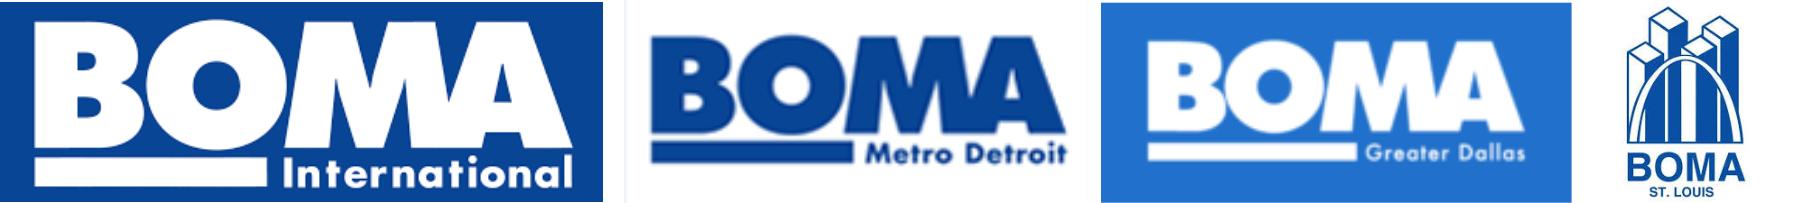 BOMA logos